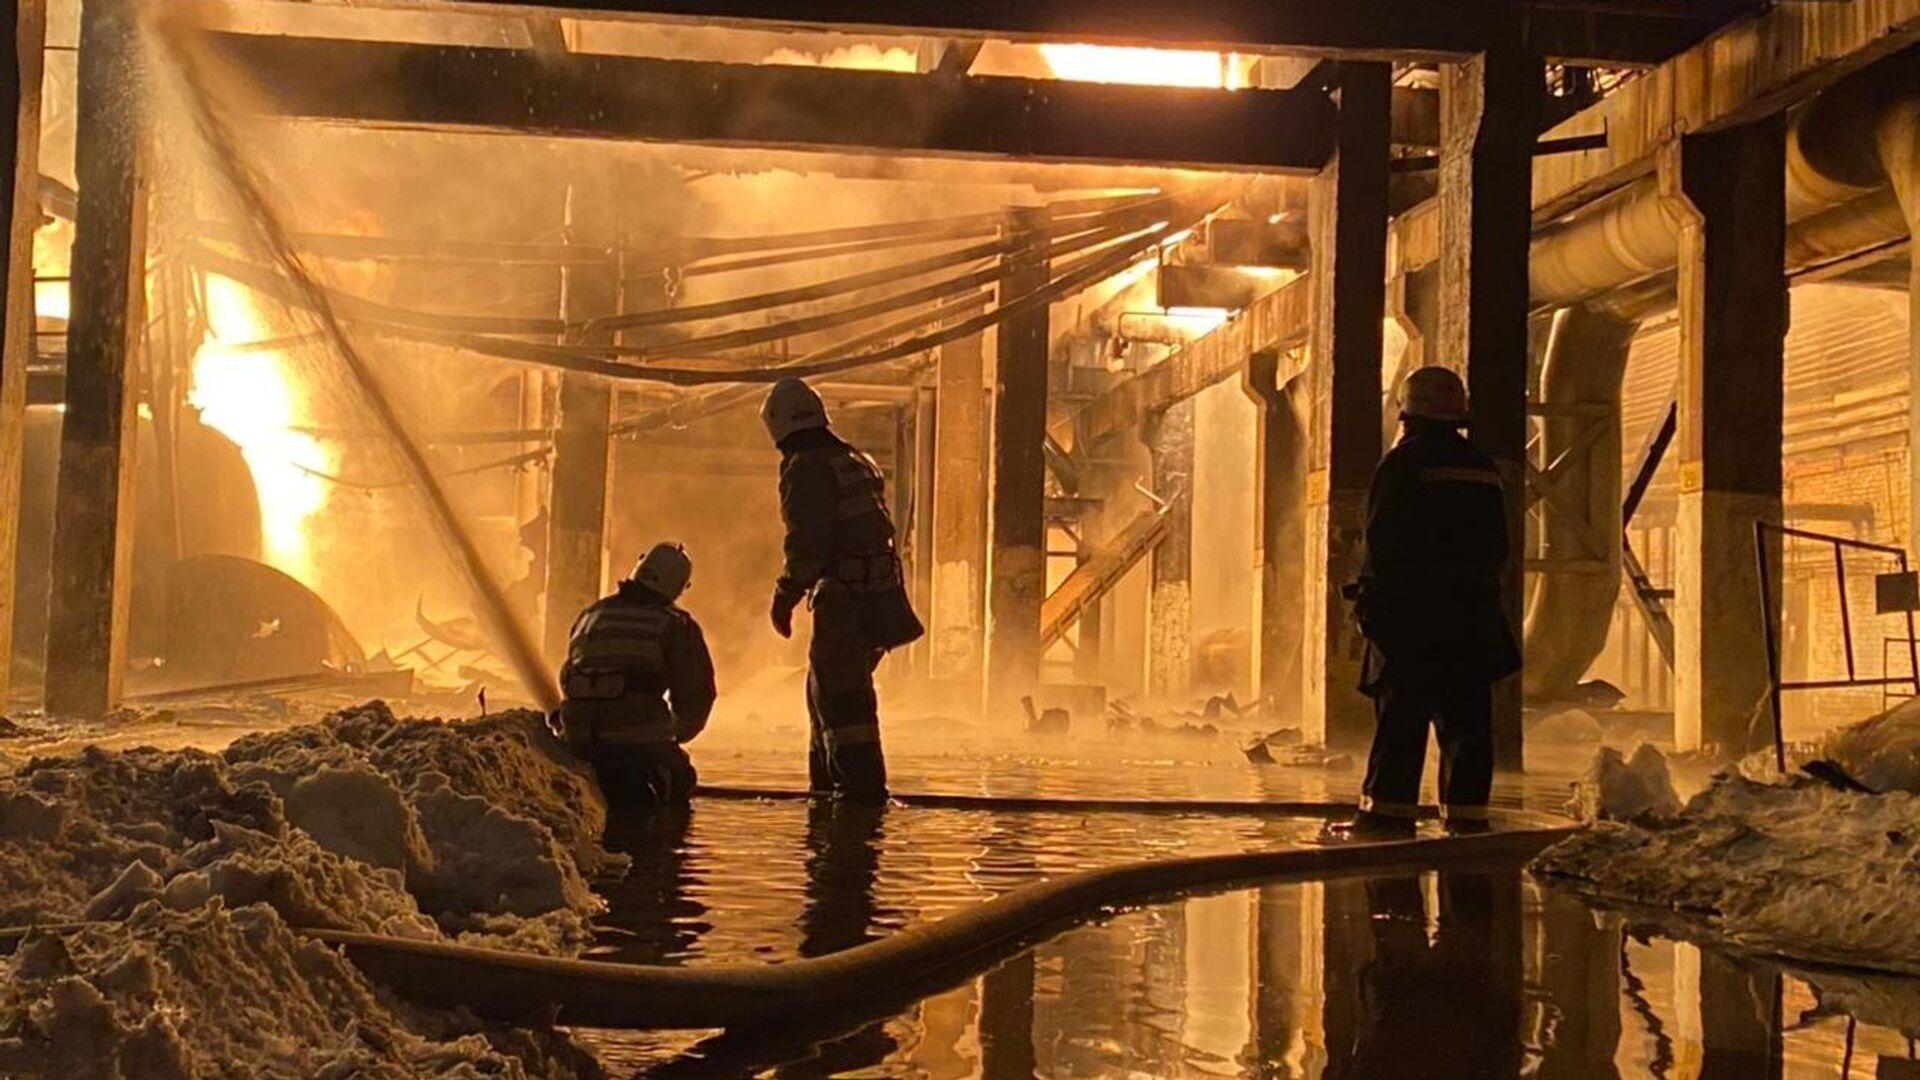 Пожар на территории завода Уфаоргсинтез - РИА Новости, 1920, 25.01.2021